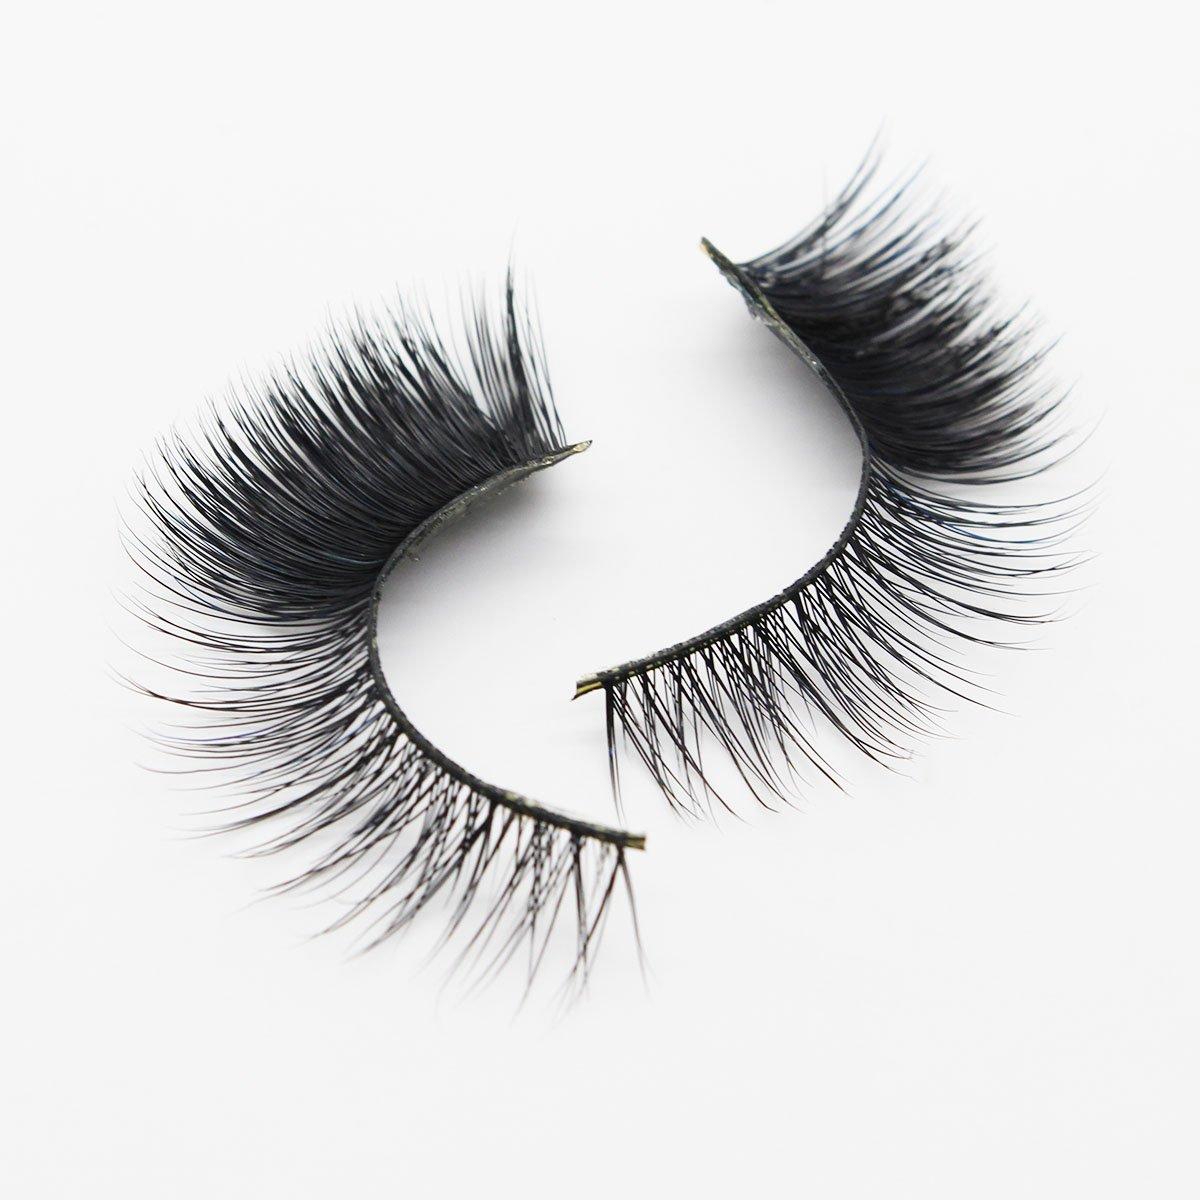 7d4e553584c Amazon.com : Ptcharming Handmade Voluminous 3D Mink False Eyelashes-Thick  Huge Dramatic Looking, Reusable with Sturdy Flexible Band, Cruelty Free  PT-MYD08 : ...